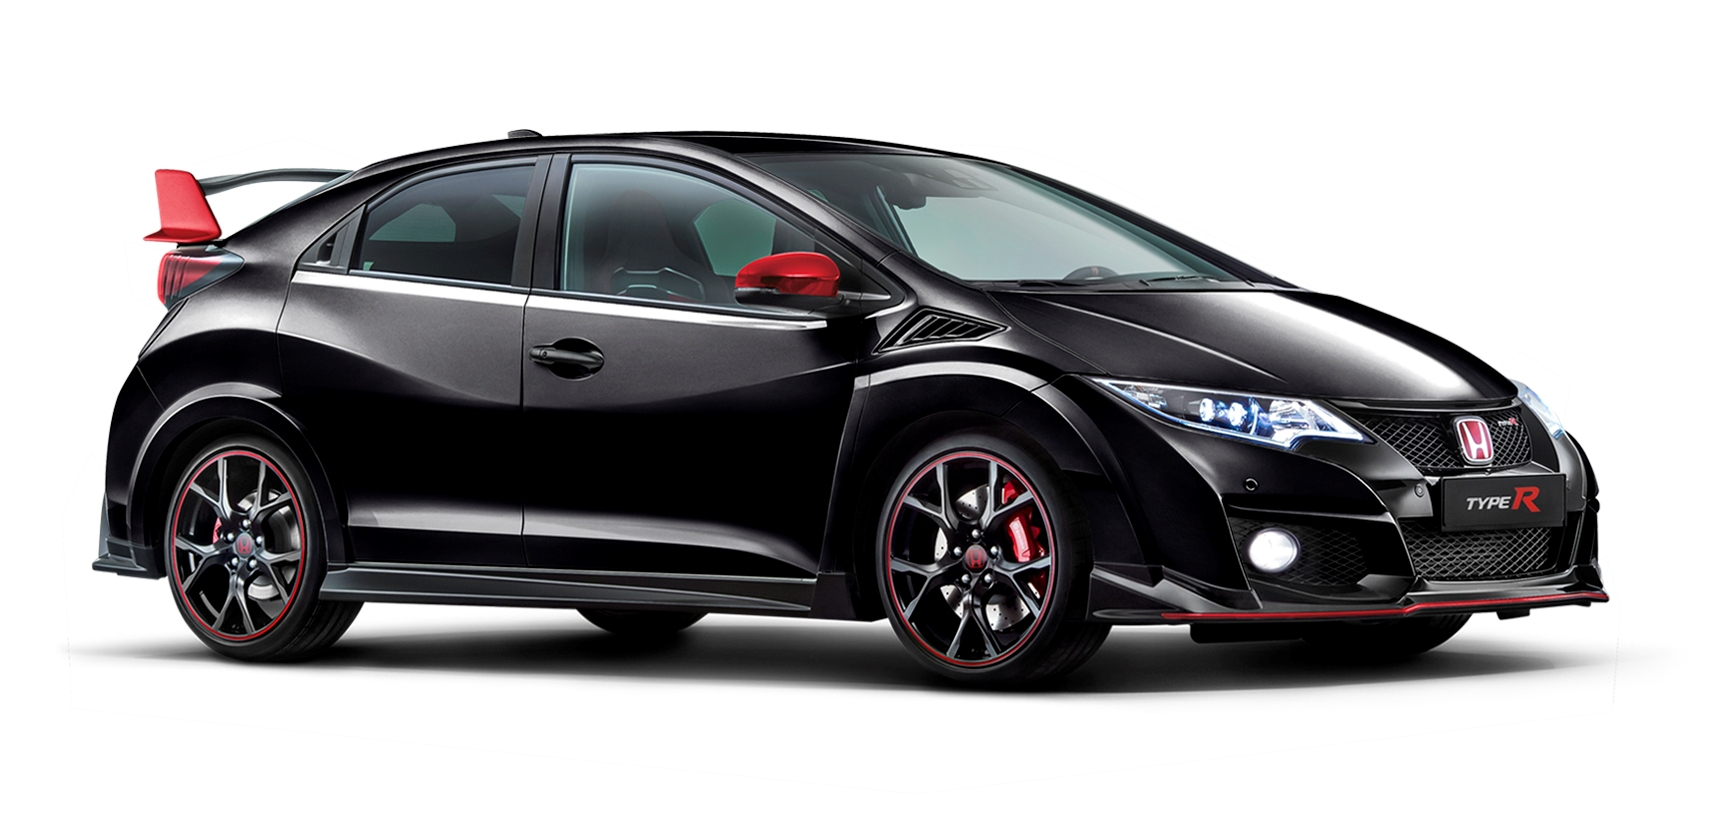 Honda civic type r limitierte black und white edition for Honda civic oil type